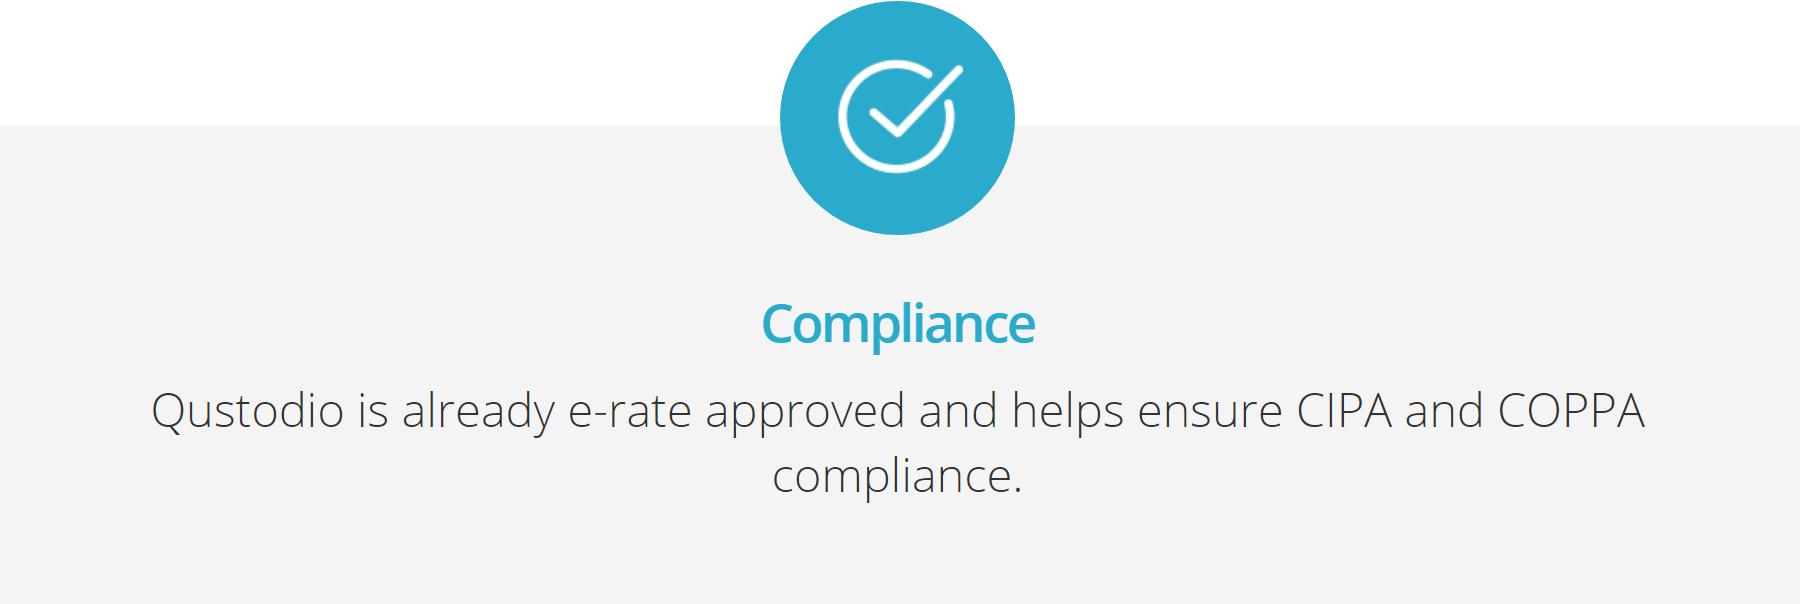 Qustodio Compliance 2